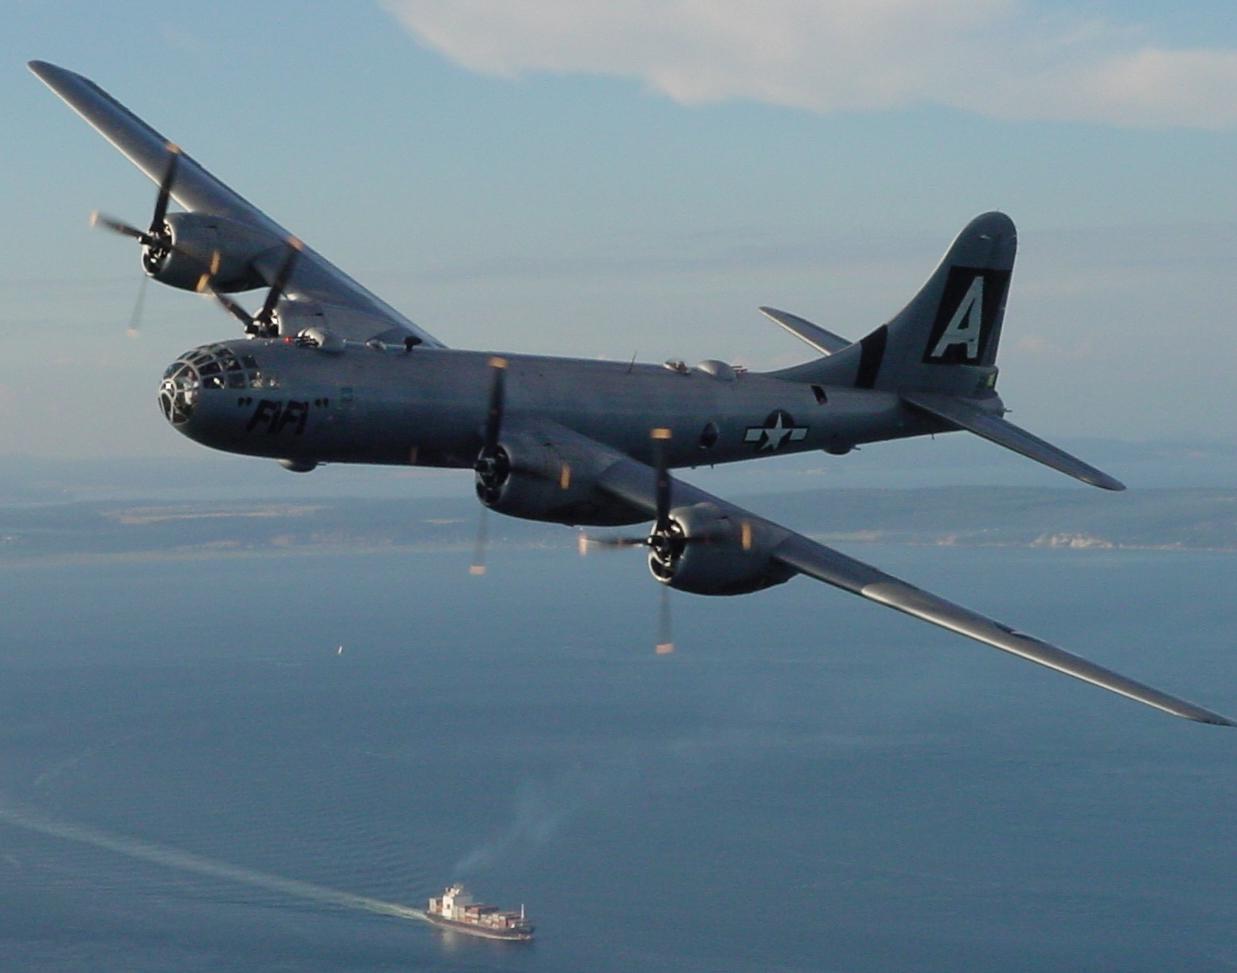 Satellitenaufnahme B29Bomber aus Kaltem Krieg in Eis